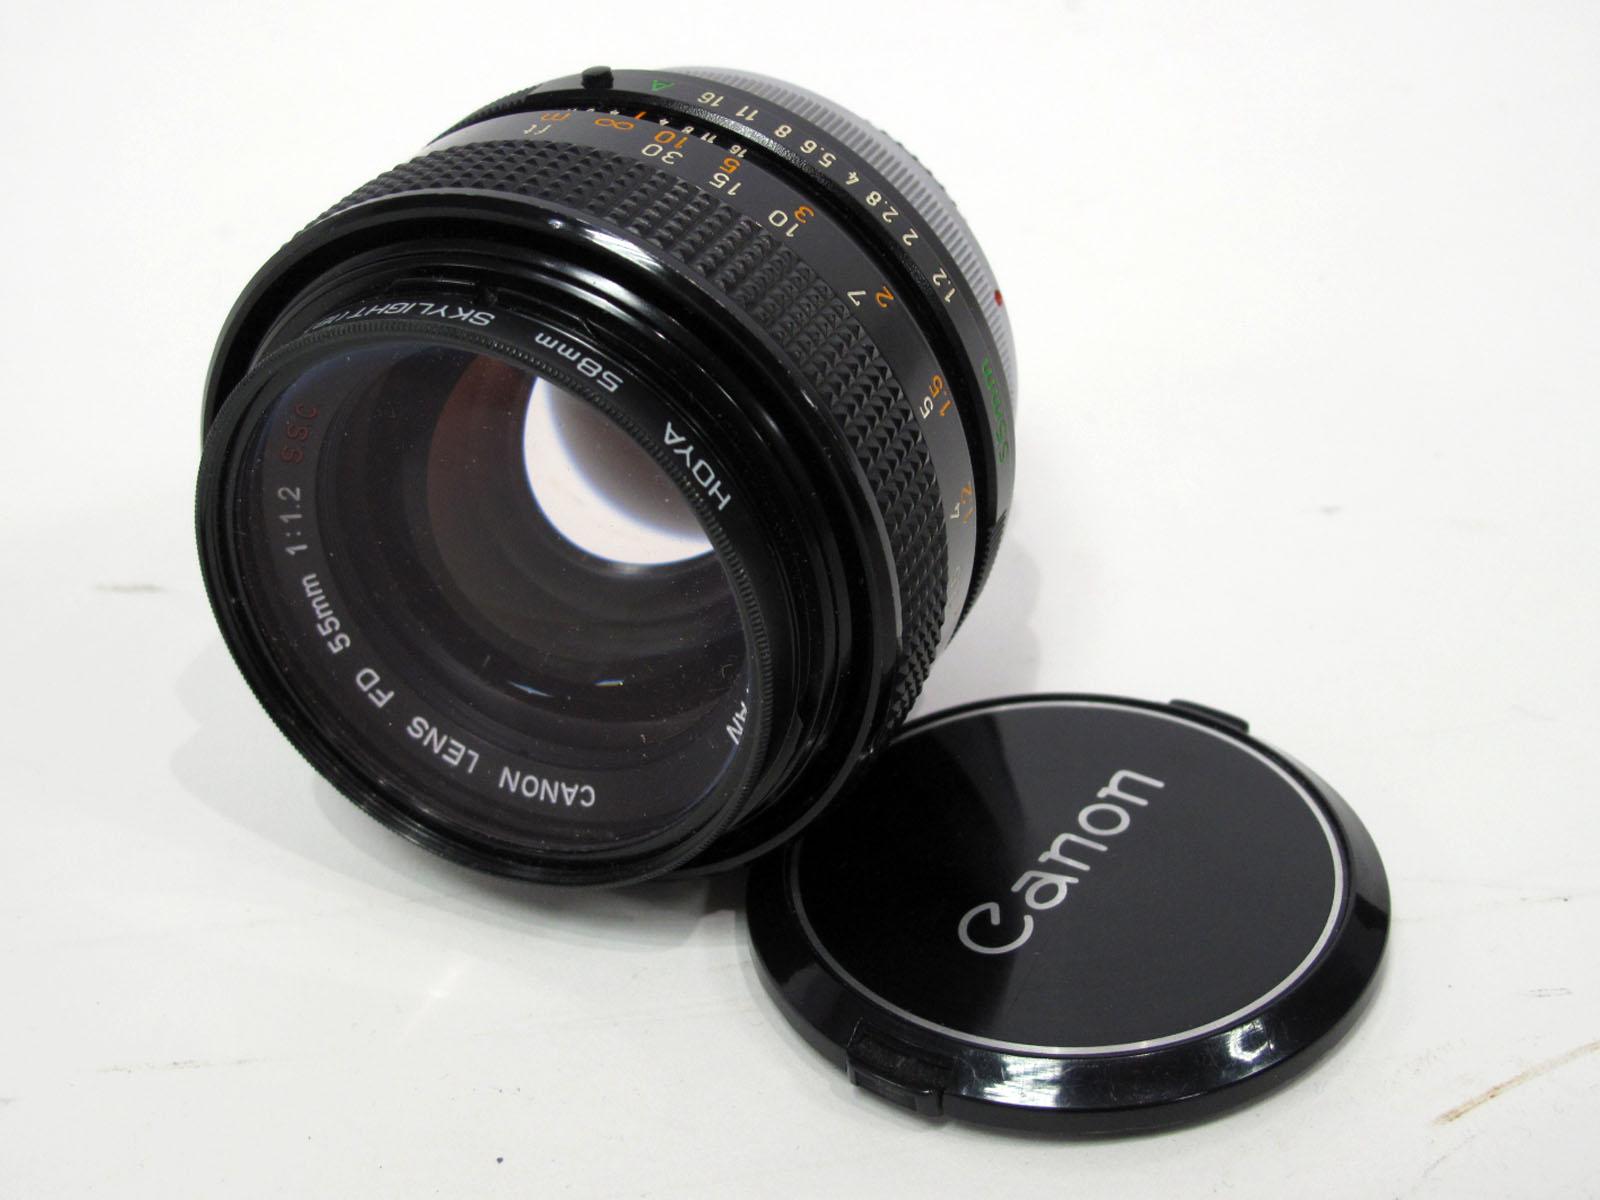 Canon Lens, FD 55mm 1:12 S.S.C. lens, in canvas case.